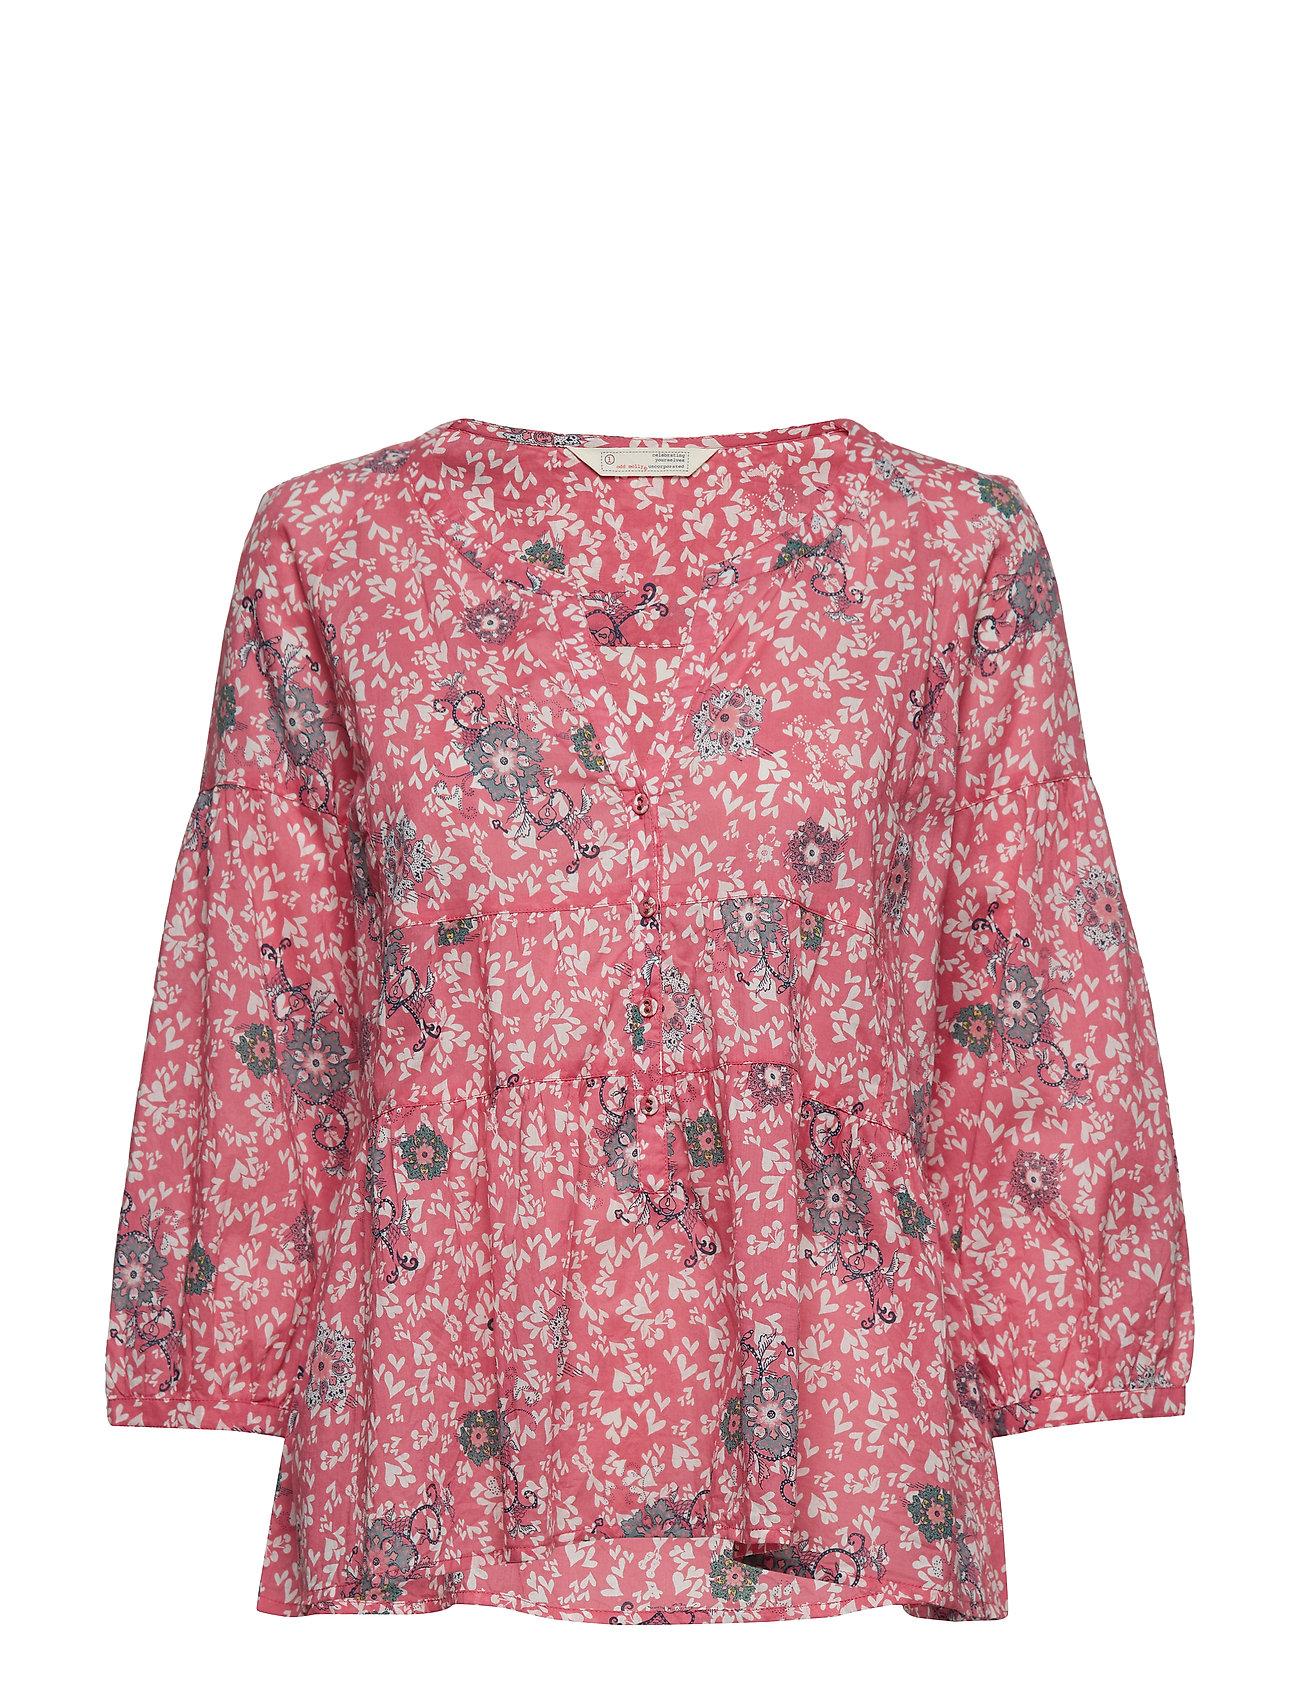 ODD MOLLY lush shake blouse - BLUSH PINK